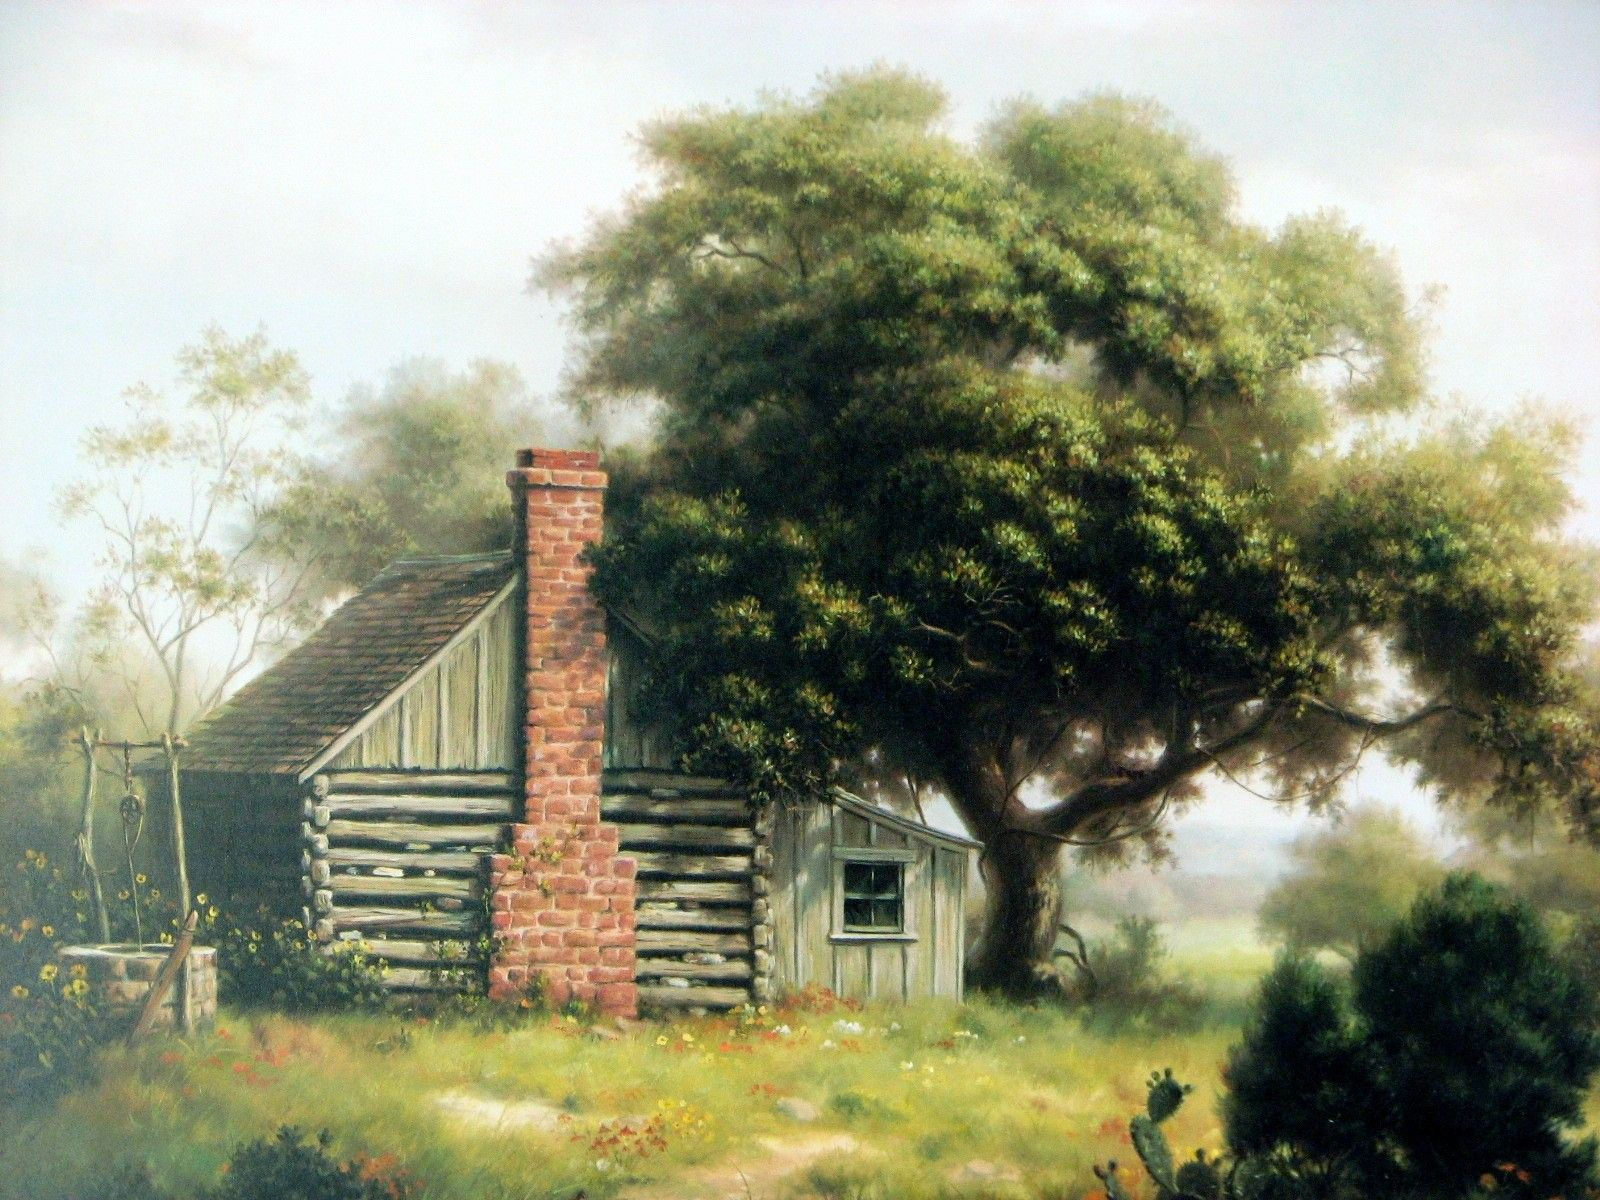 Yester Years . Landscapes Artist Dalhart Windberg Title Yesteryear C13